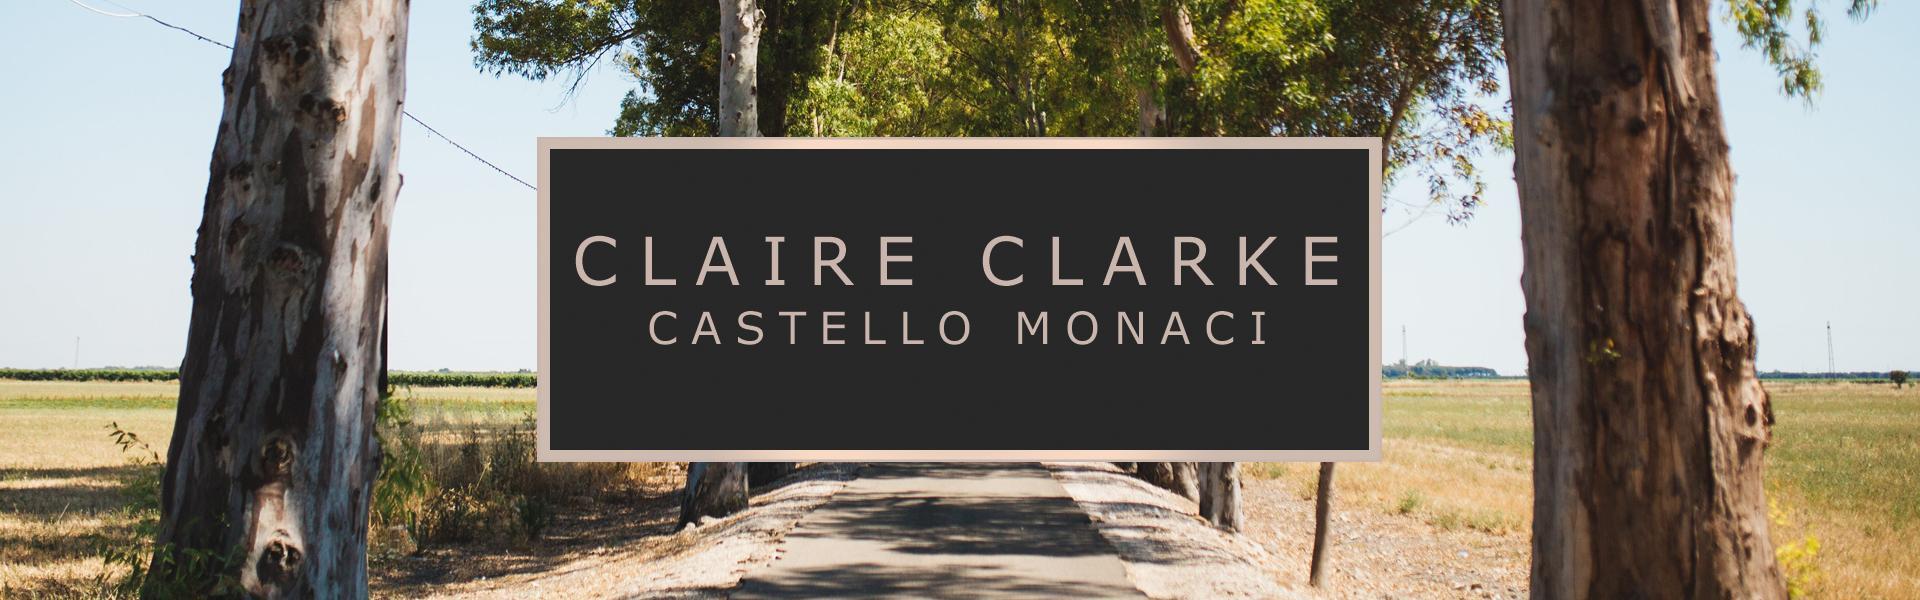 Castello Monaci Italy